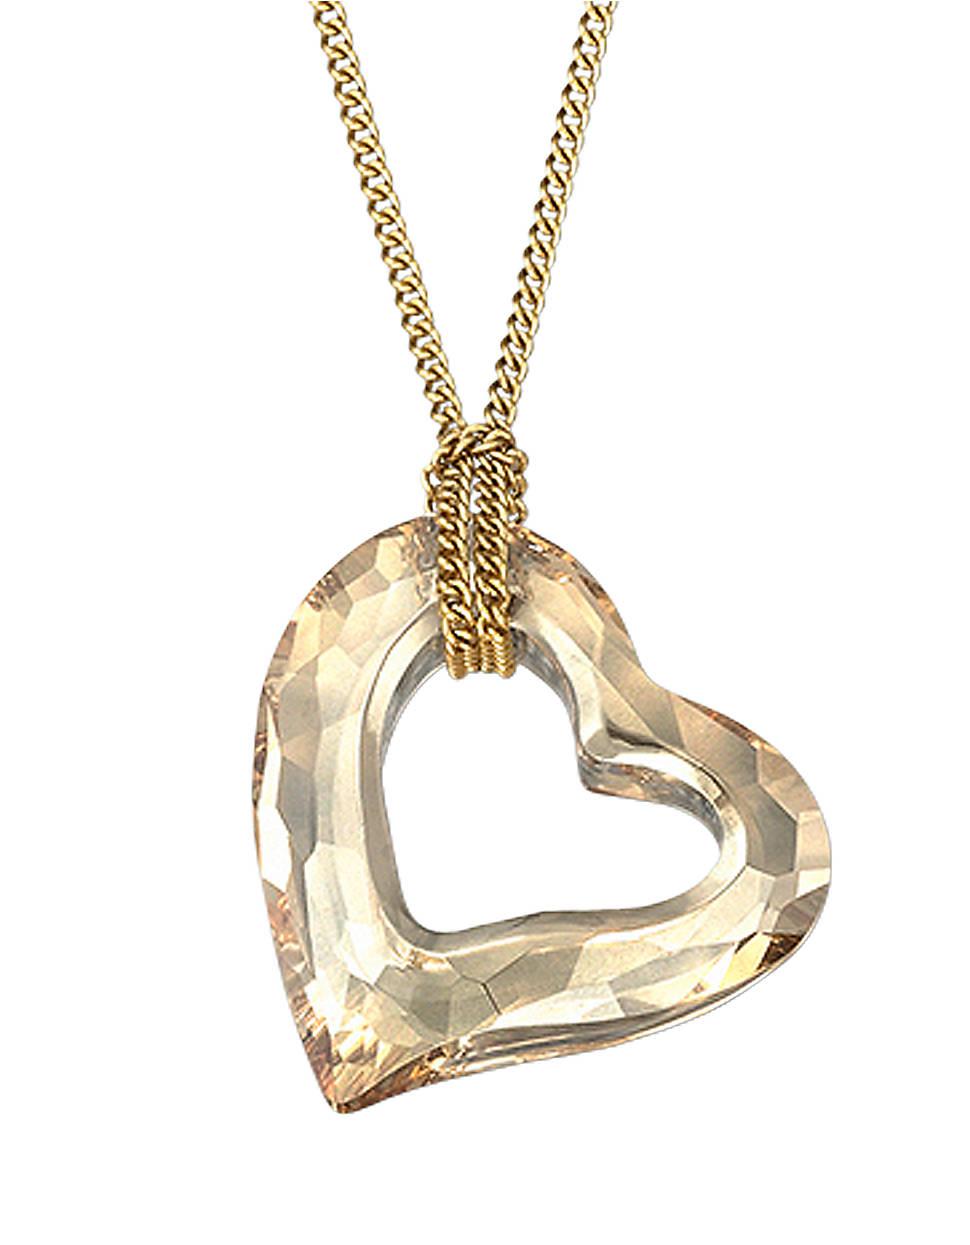 swarovski mini heart crystal pendant necklace in gold no. Black Bedroom Furniture Sets. Home Design Ideas